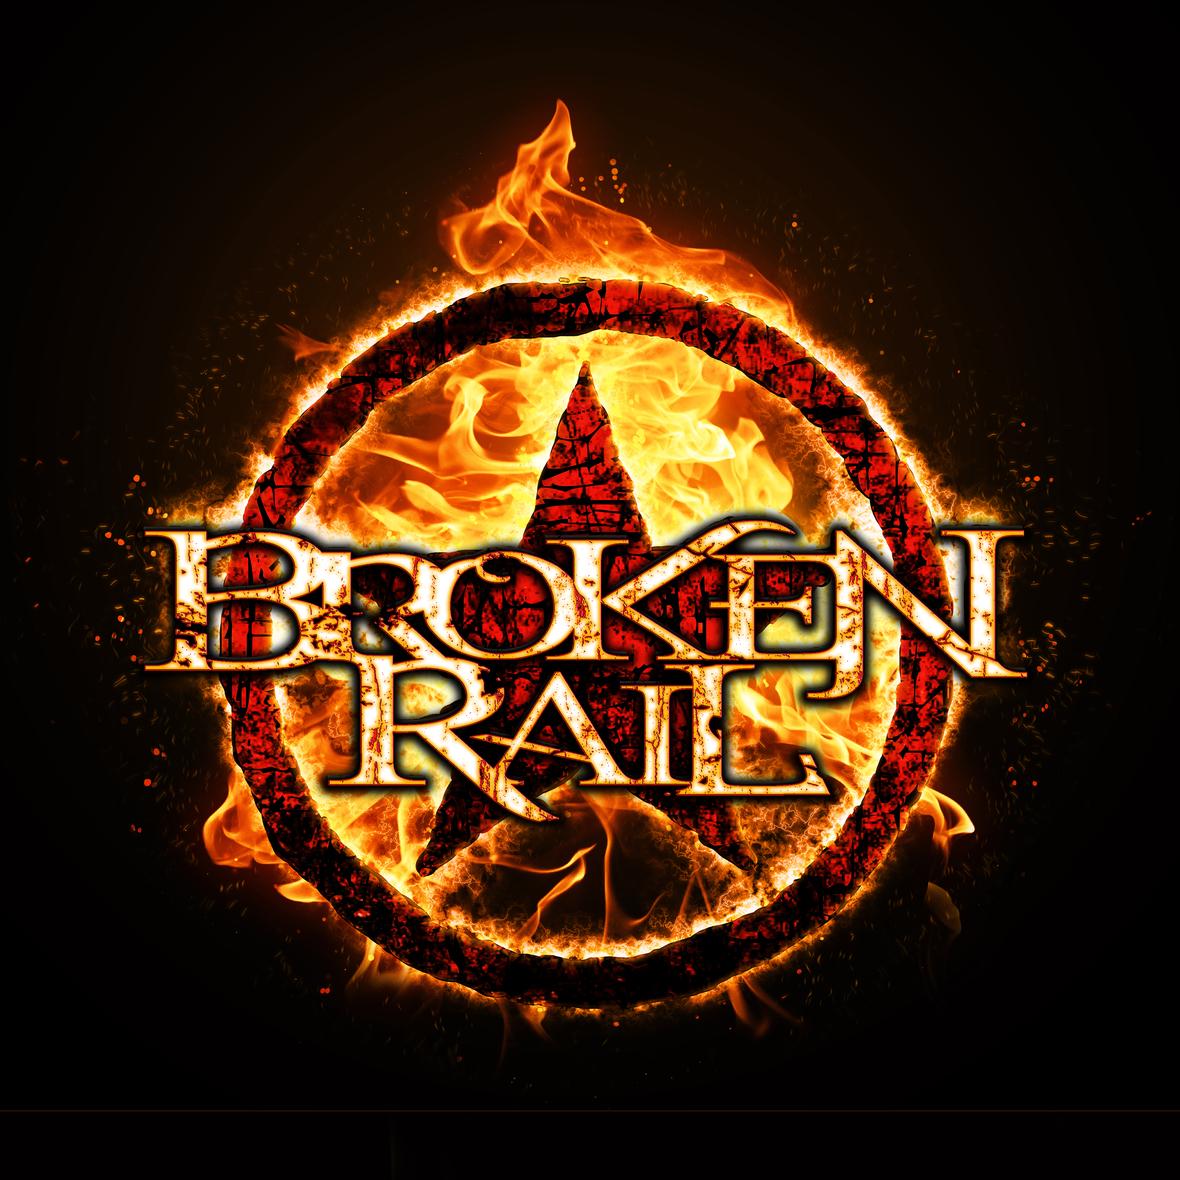 BrokenRail-BrokenRail EP 2016 FINAL RGB 16x16